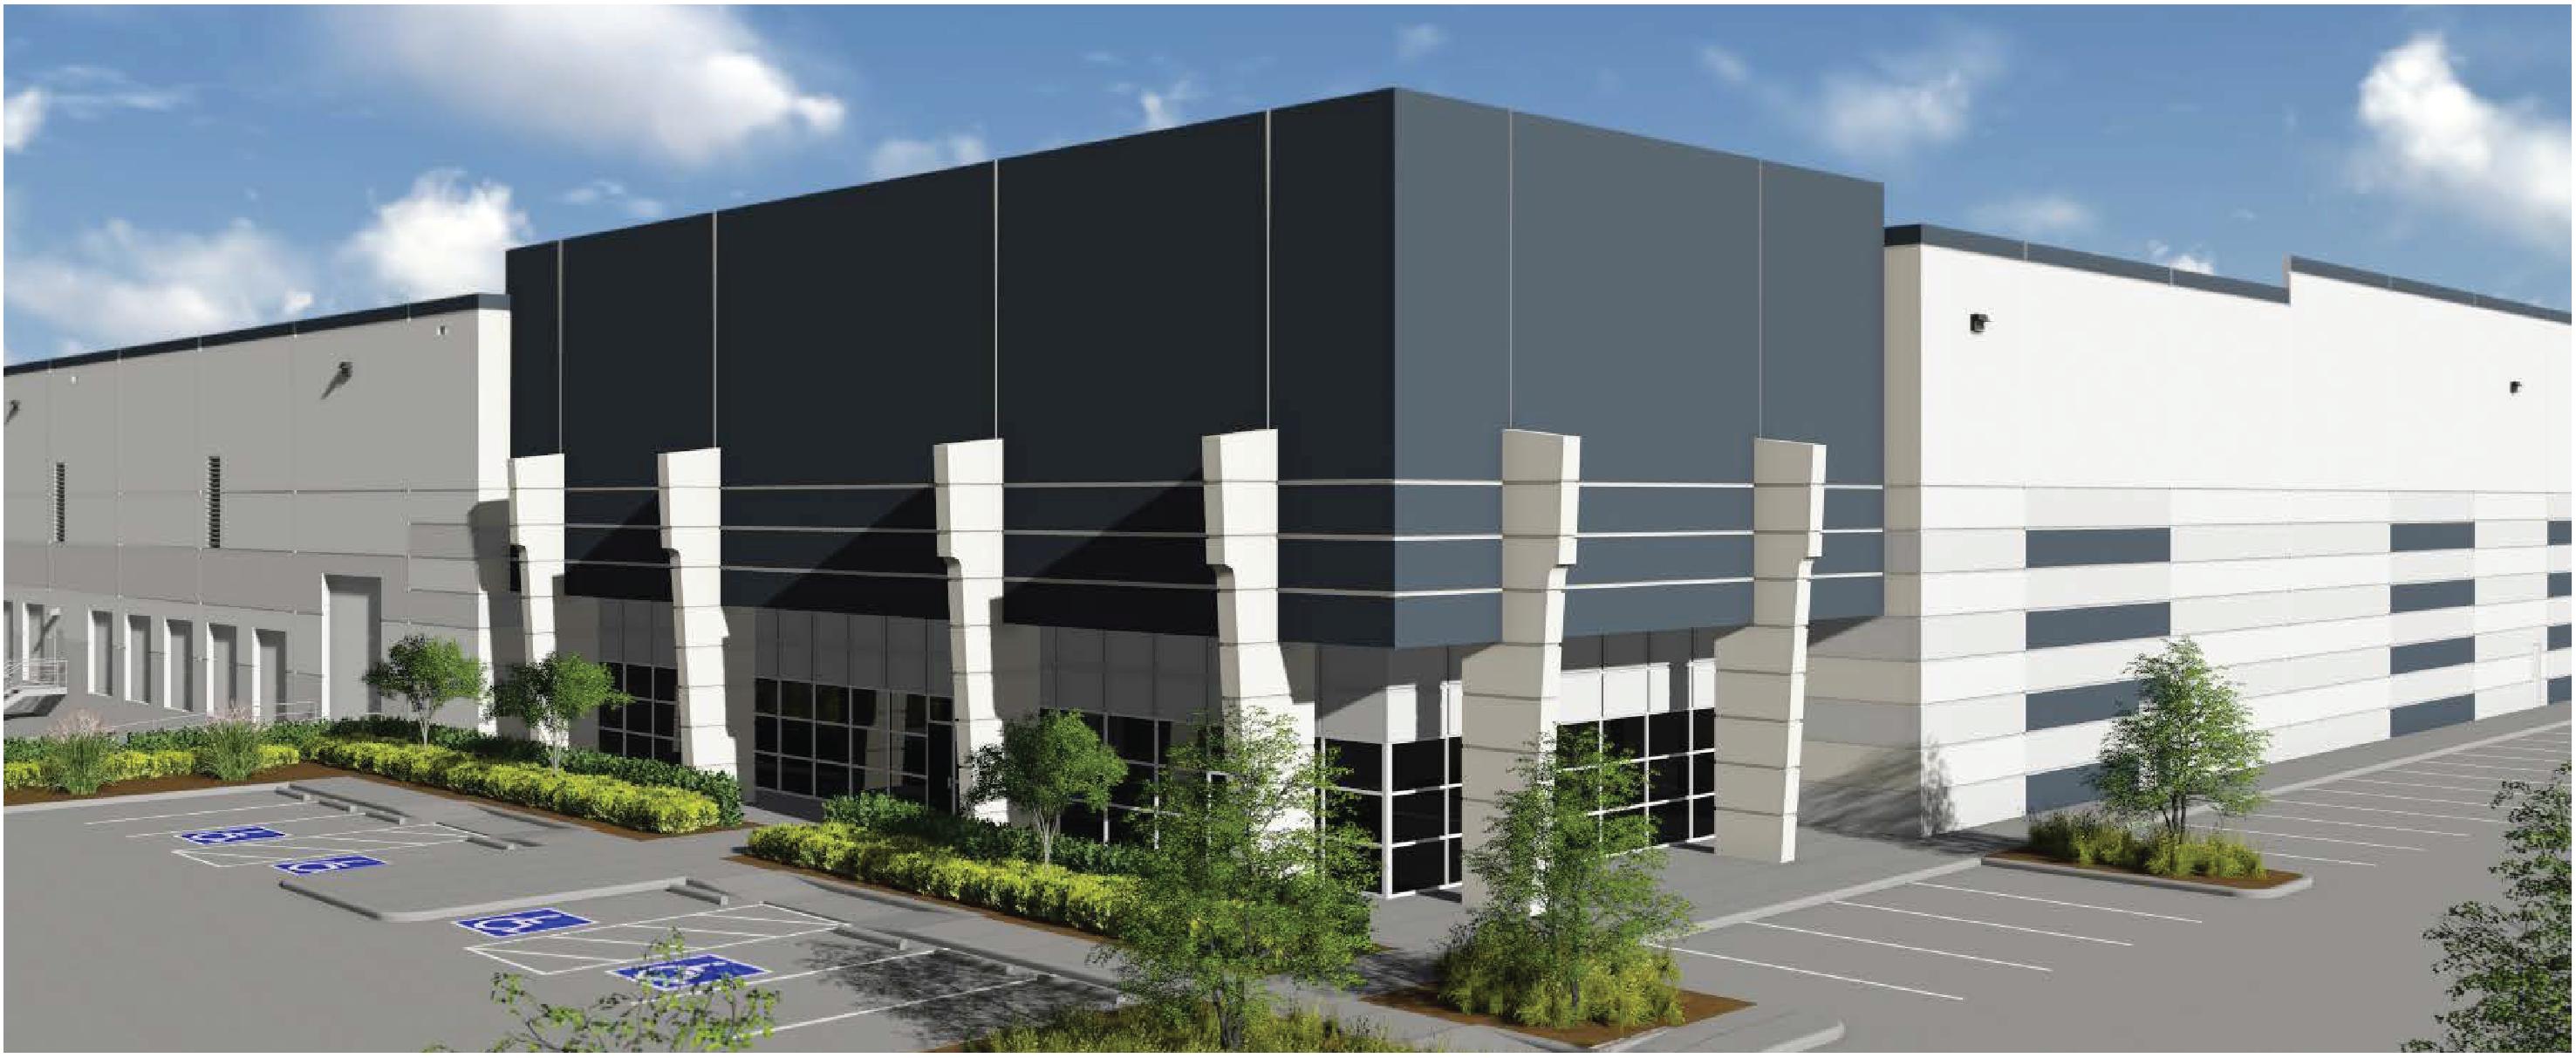 Ups Will Add More Than 1000 Jobs At A New Arlington Distribution